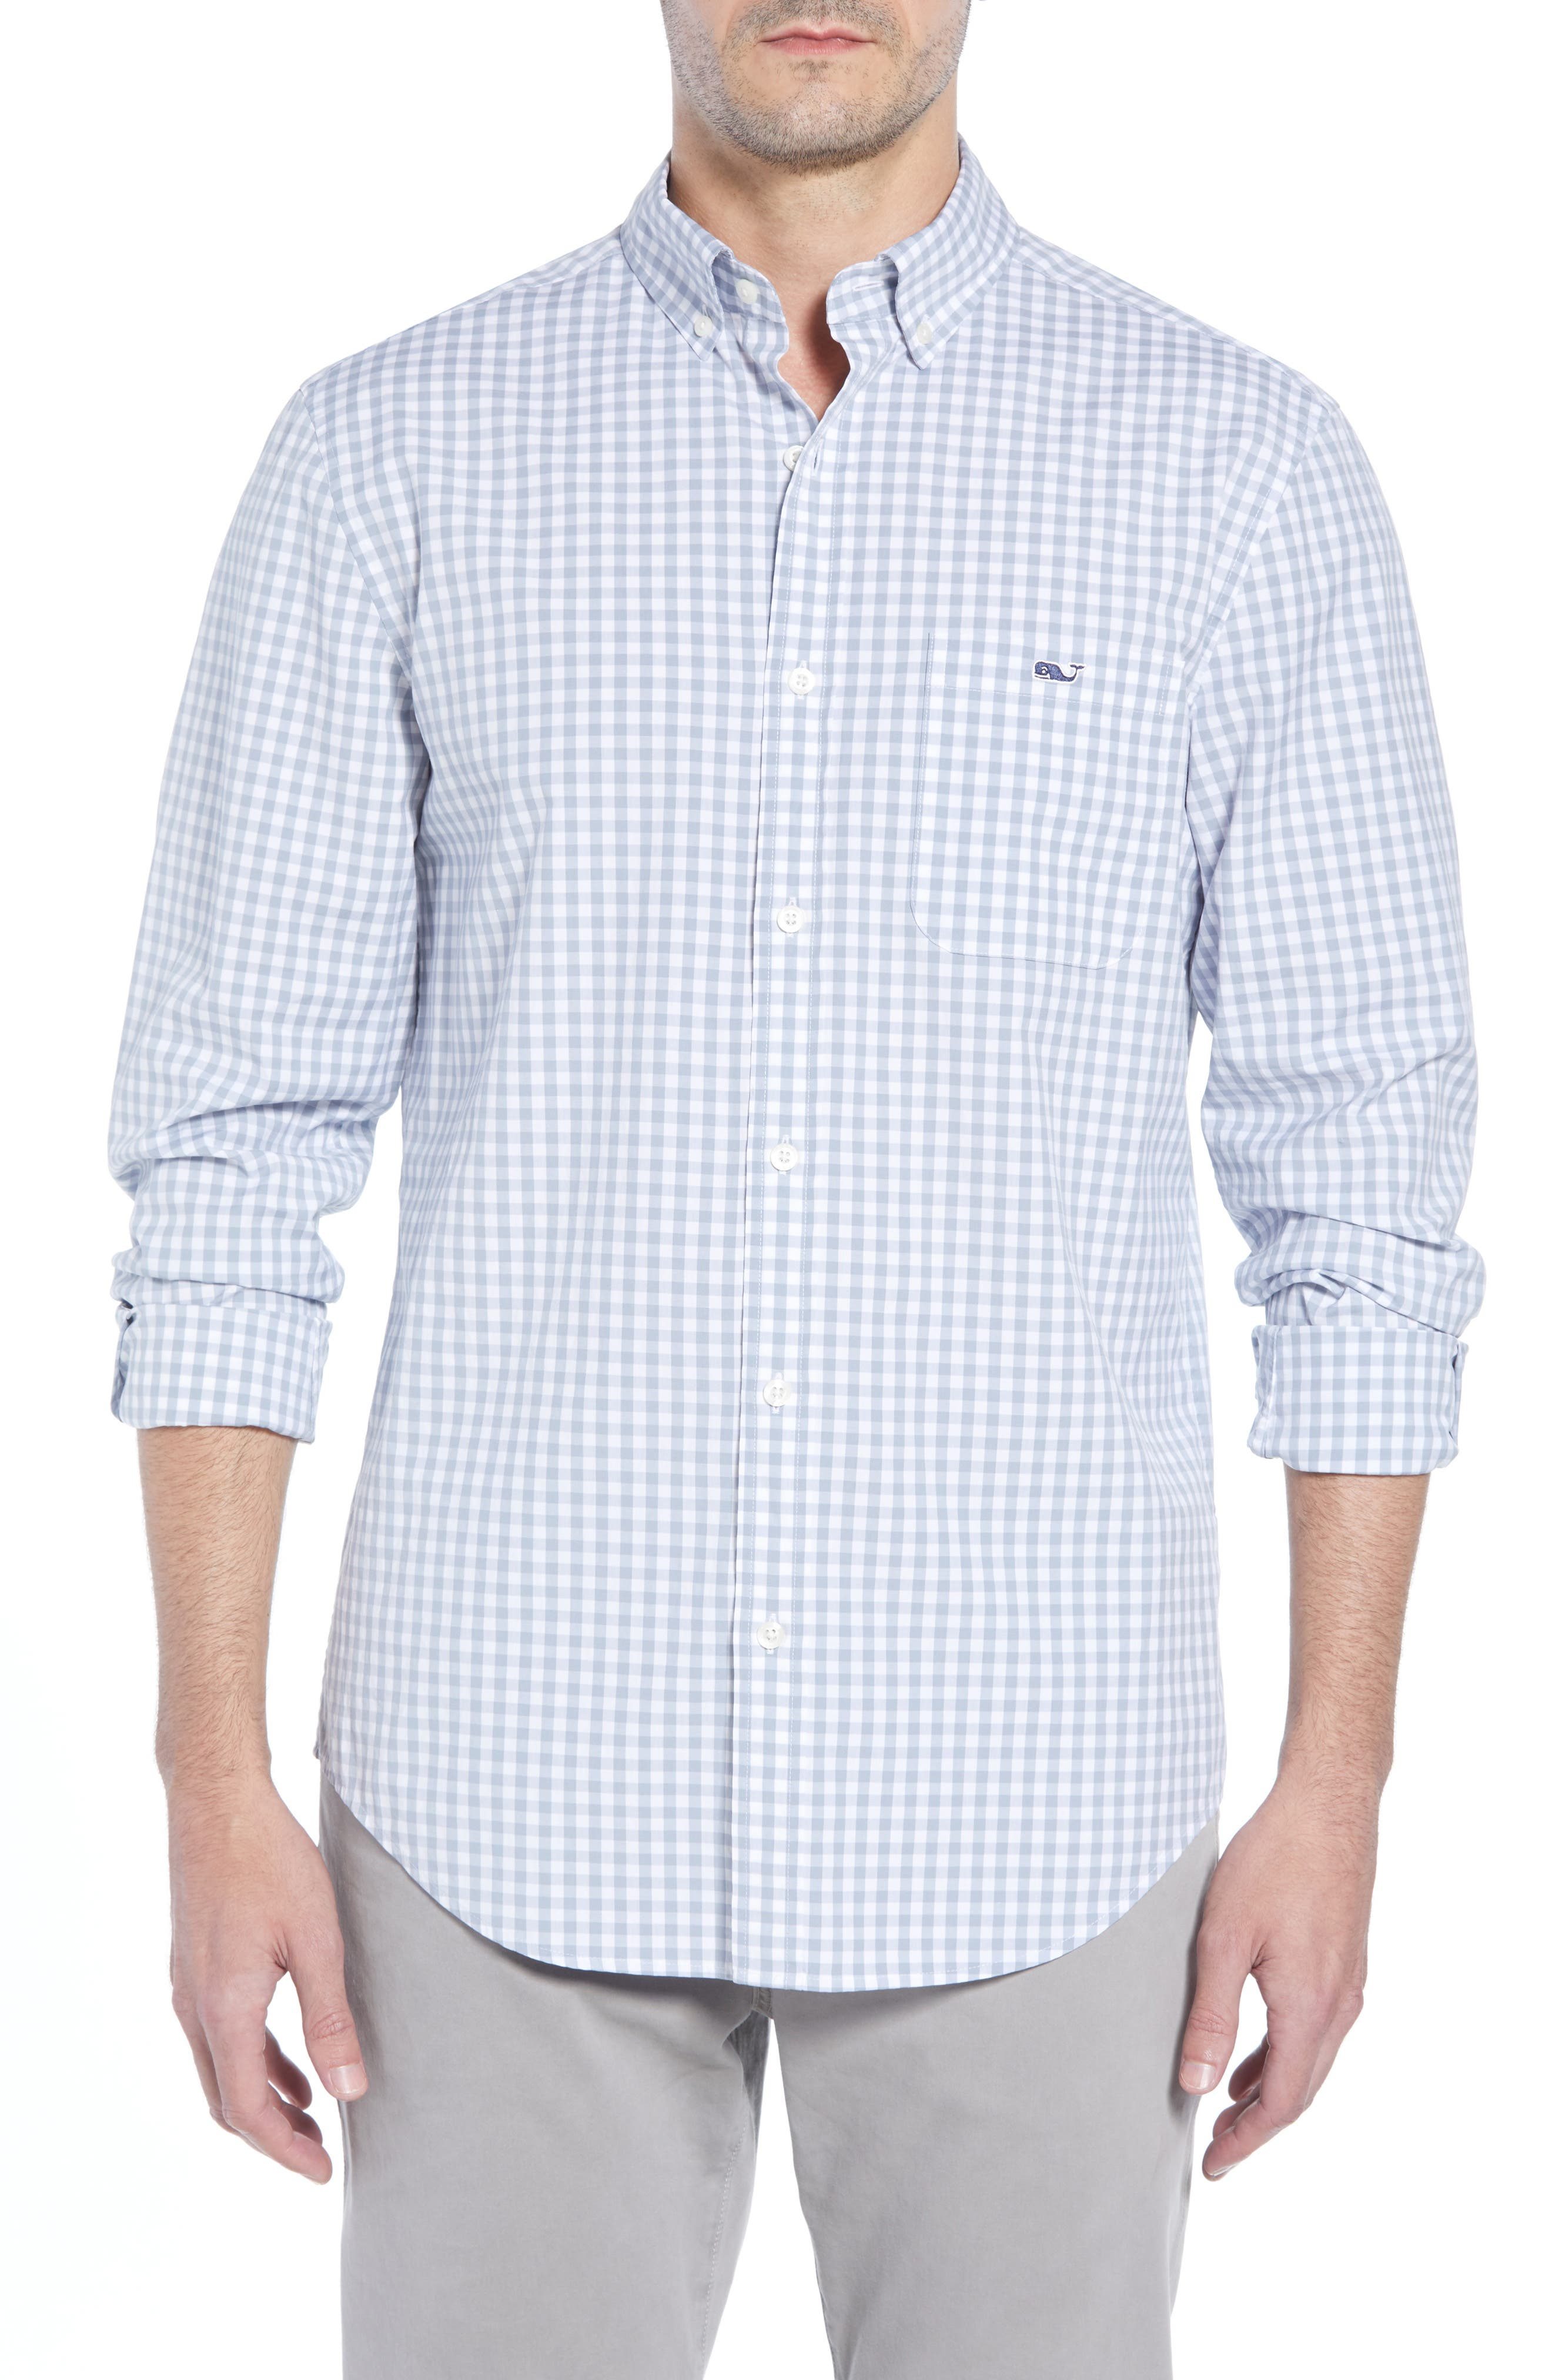 VINEYARD VINES, Carleton Classic Fit Gingham Buttondown Shirt, Main thumbnail 1, color, 023